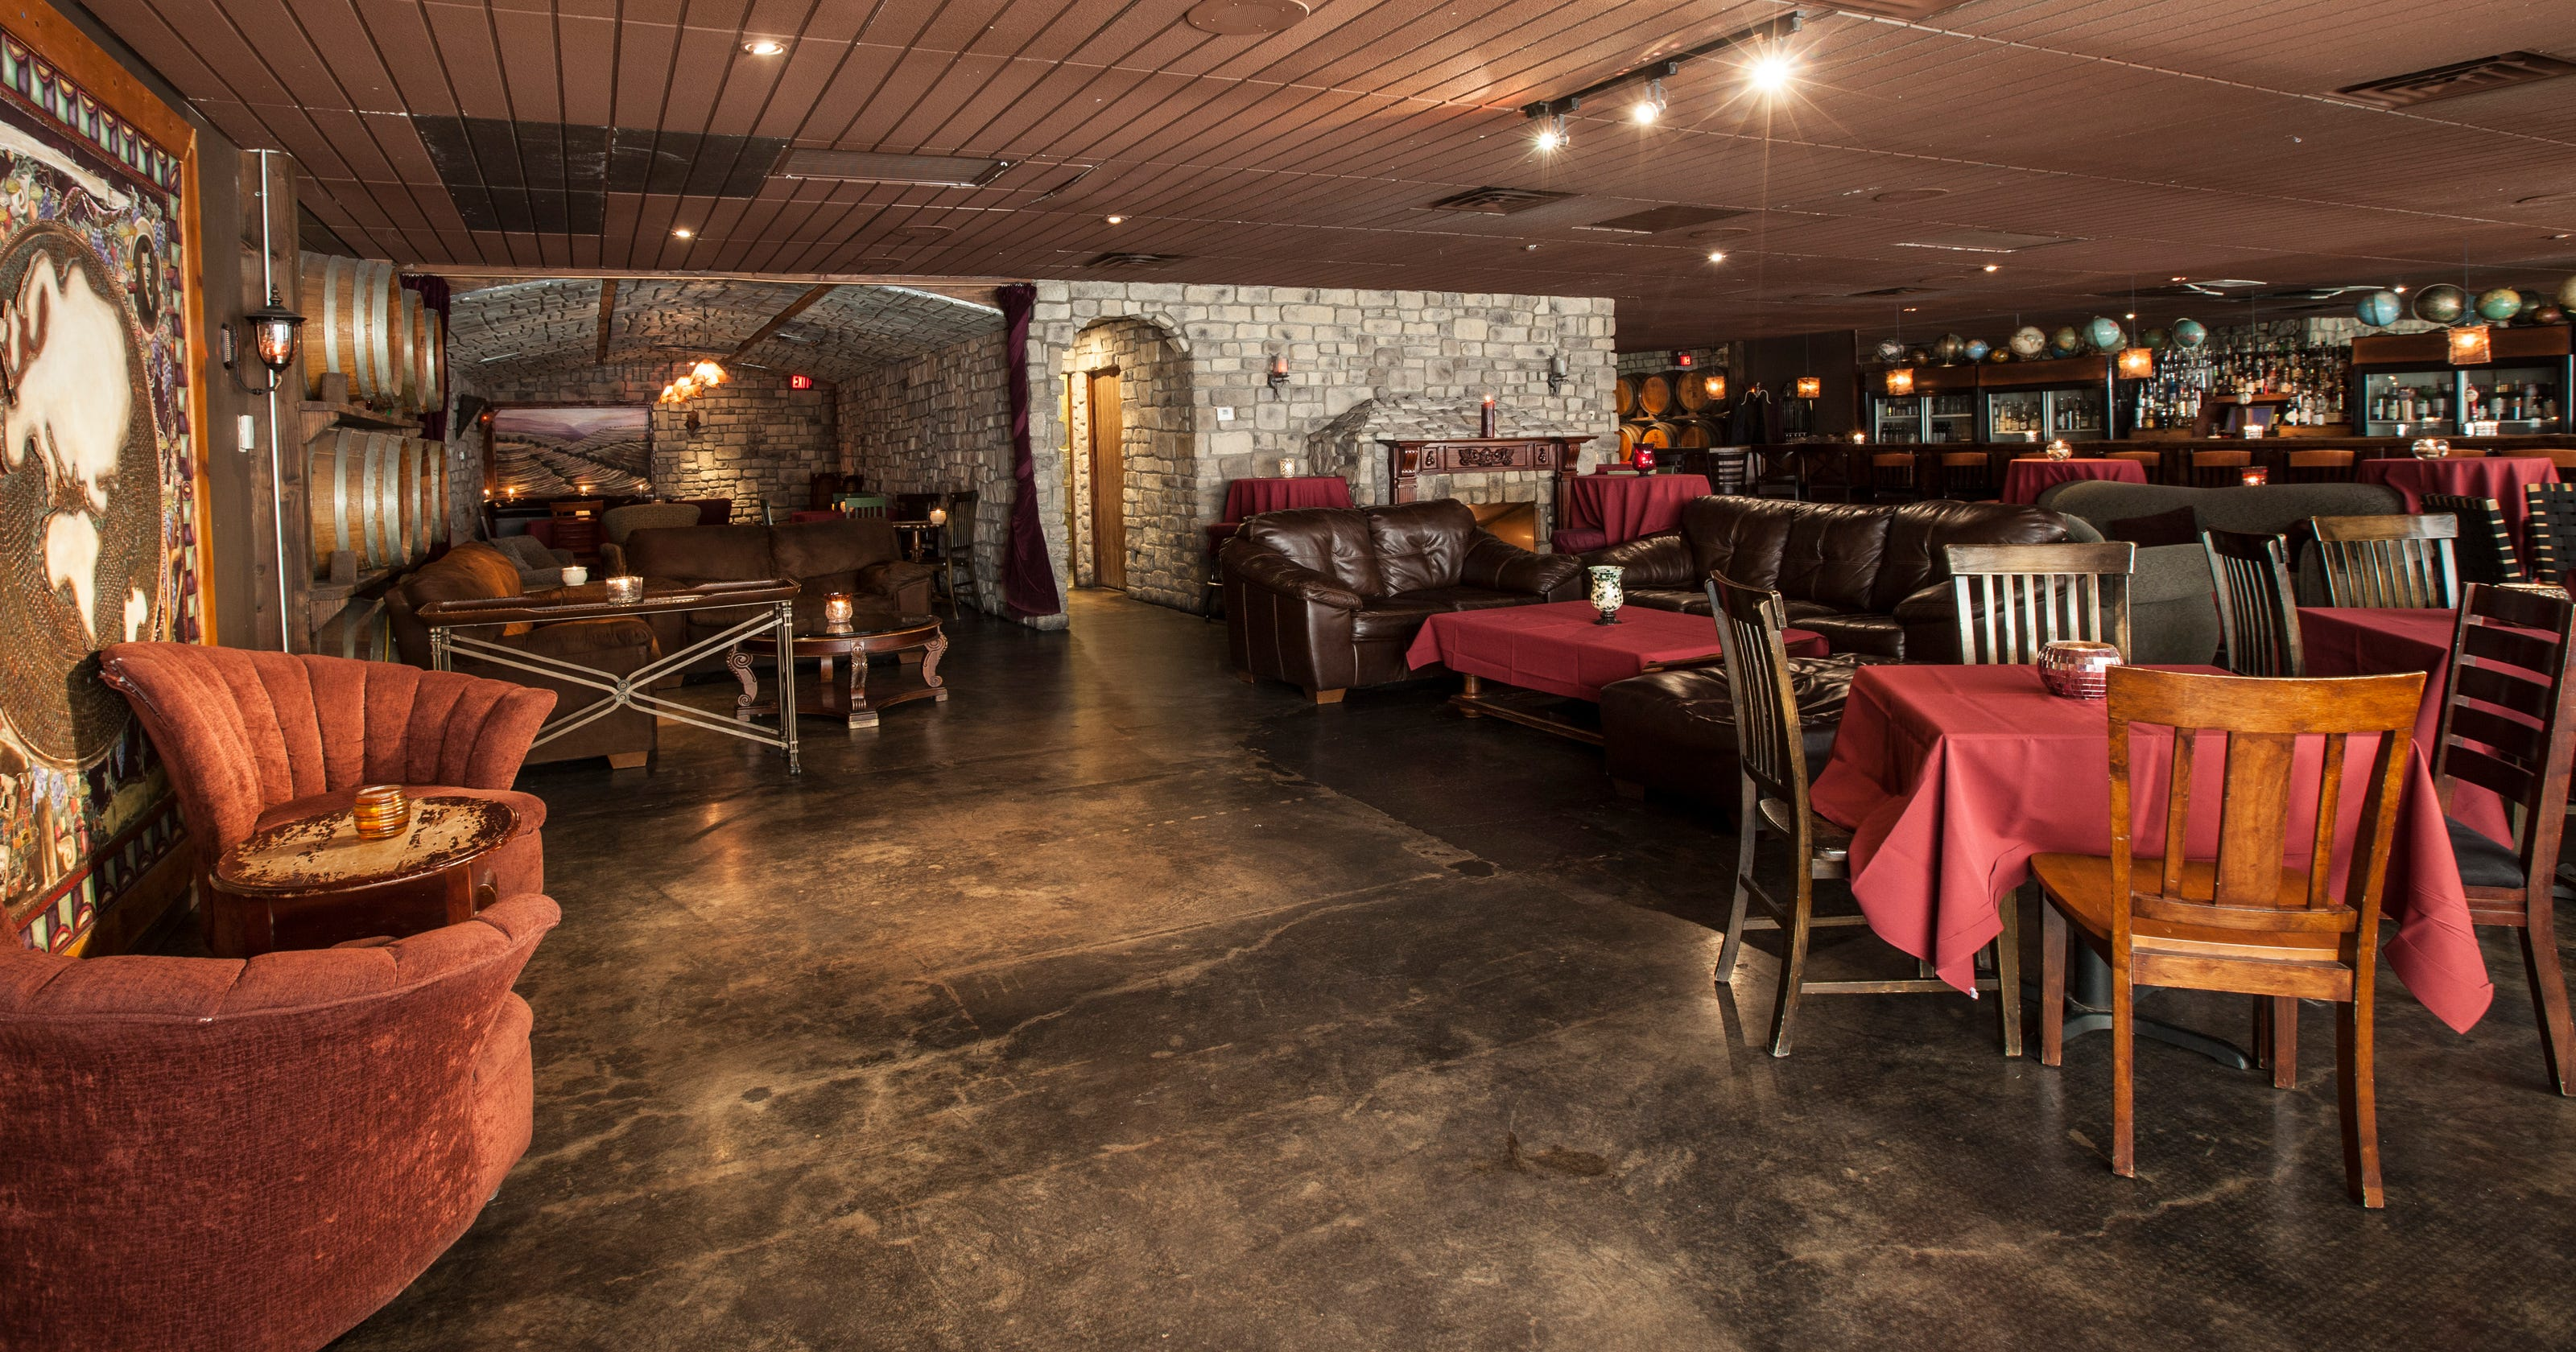 Kazimierz World Wine Bar In Scottsdale Closes Along With